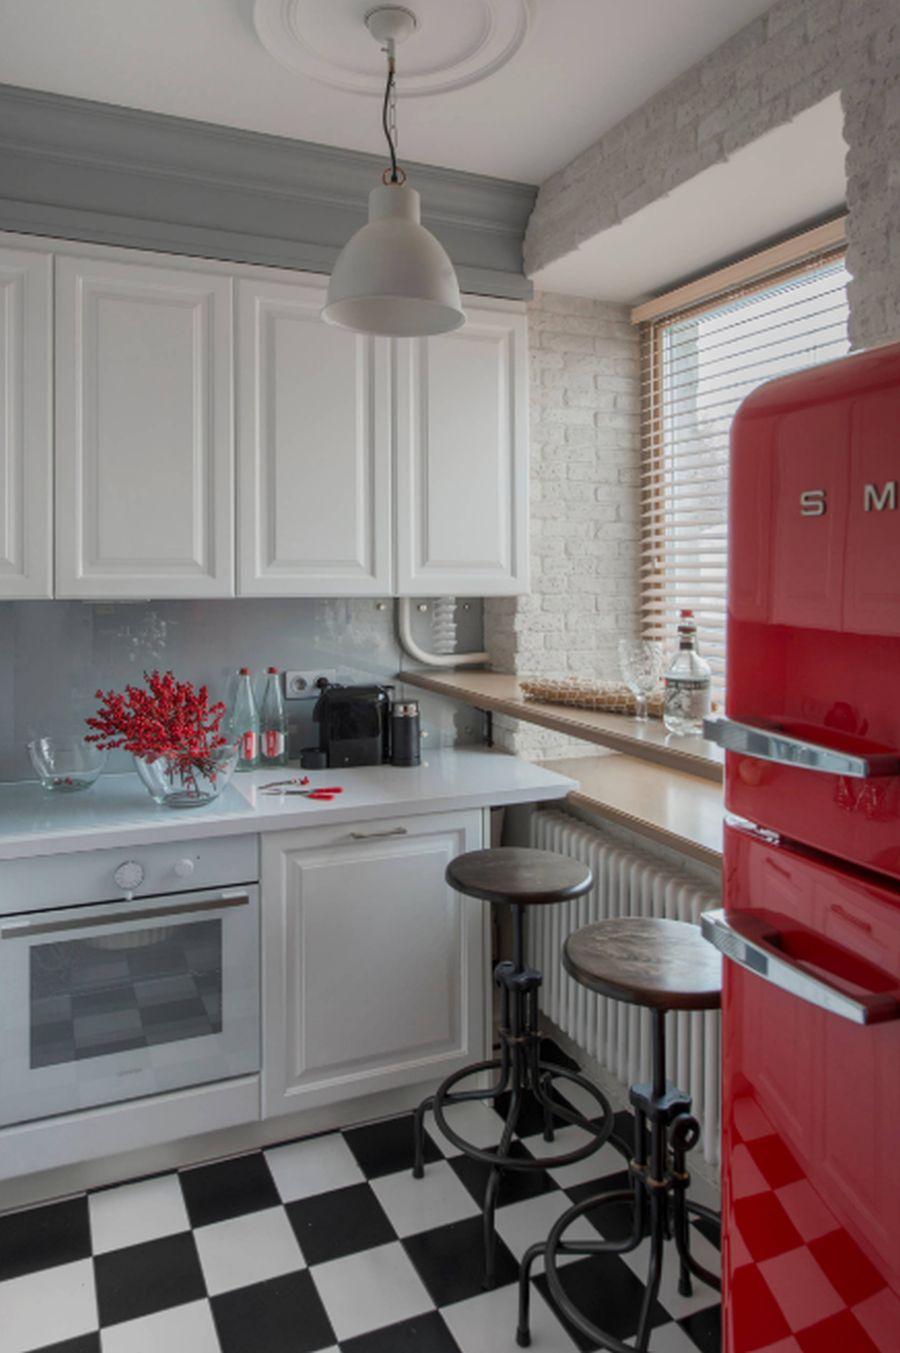 adelaparvu-com-despre-reoganizarea-unui-apartament-de-2-camere-in-3-camere-54-mp-designer-masha-kunyakina-foto-olga-melekesceva-5